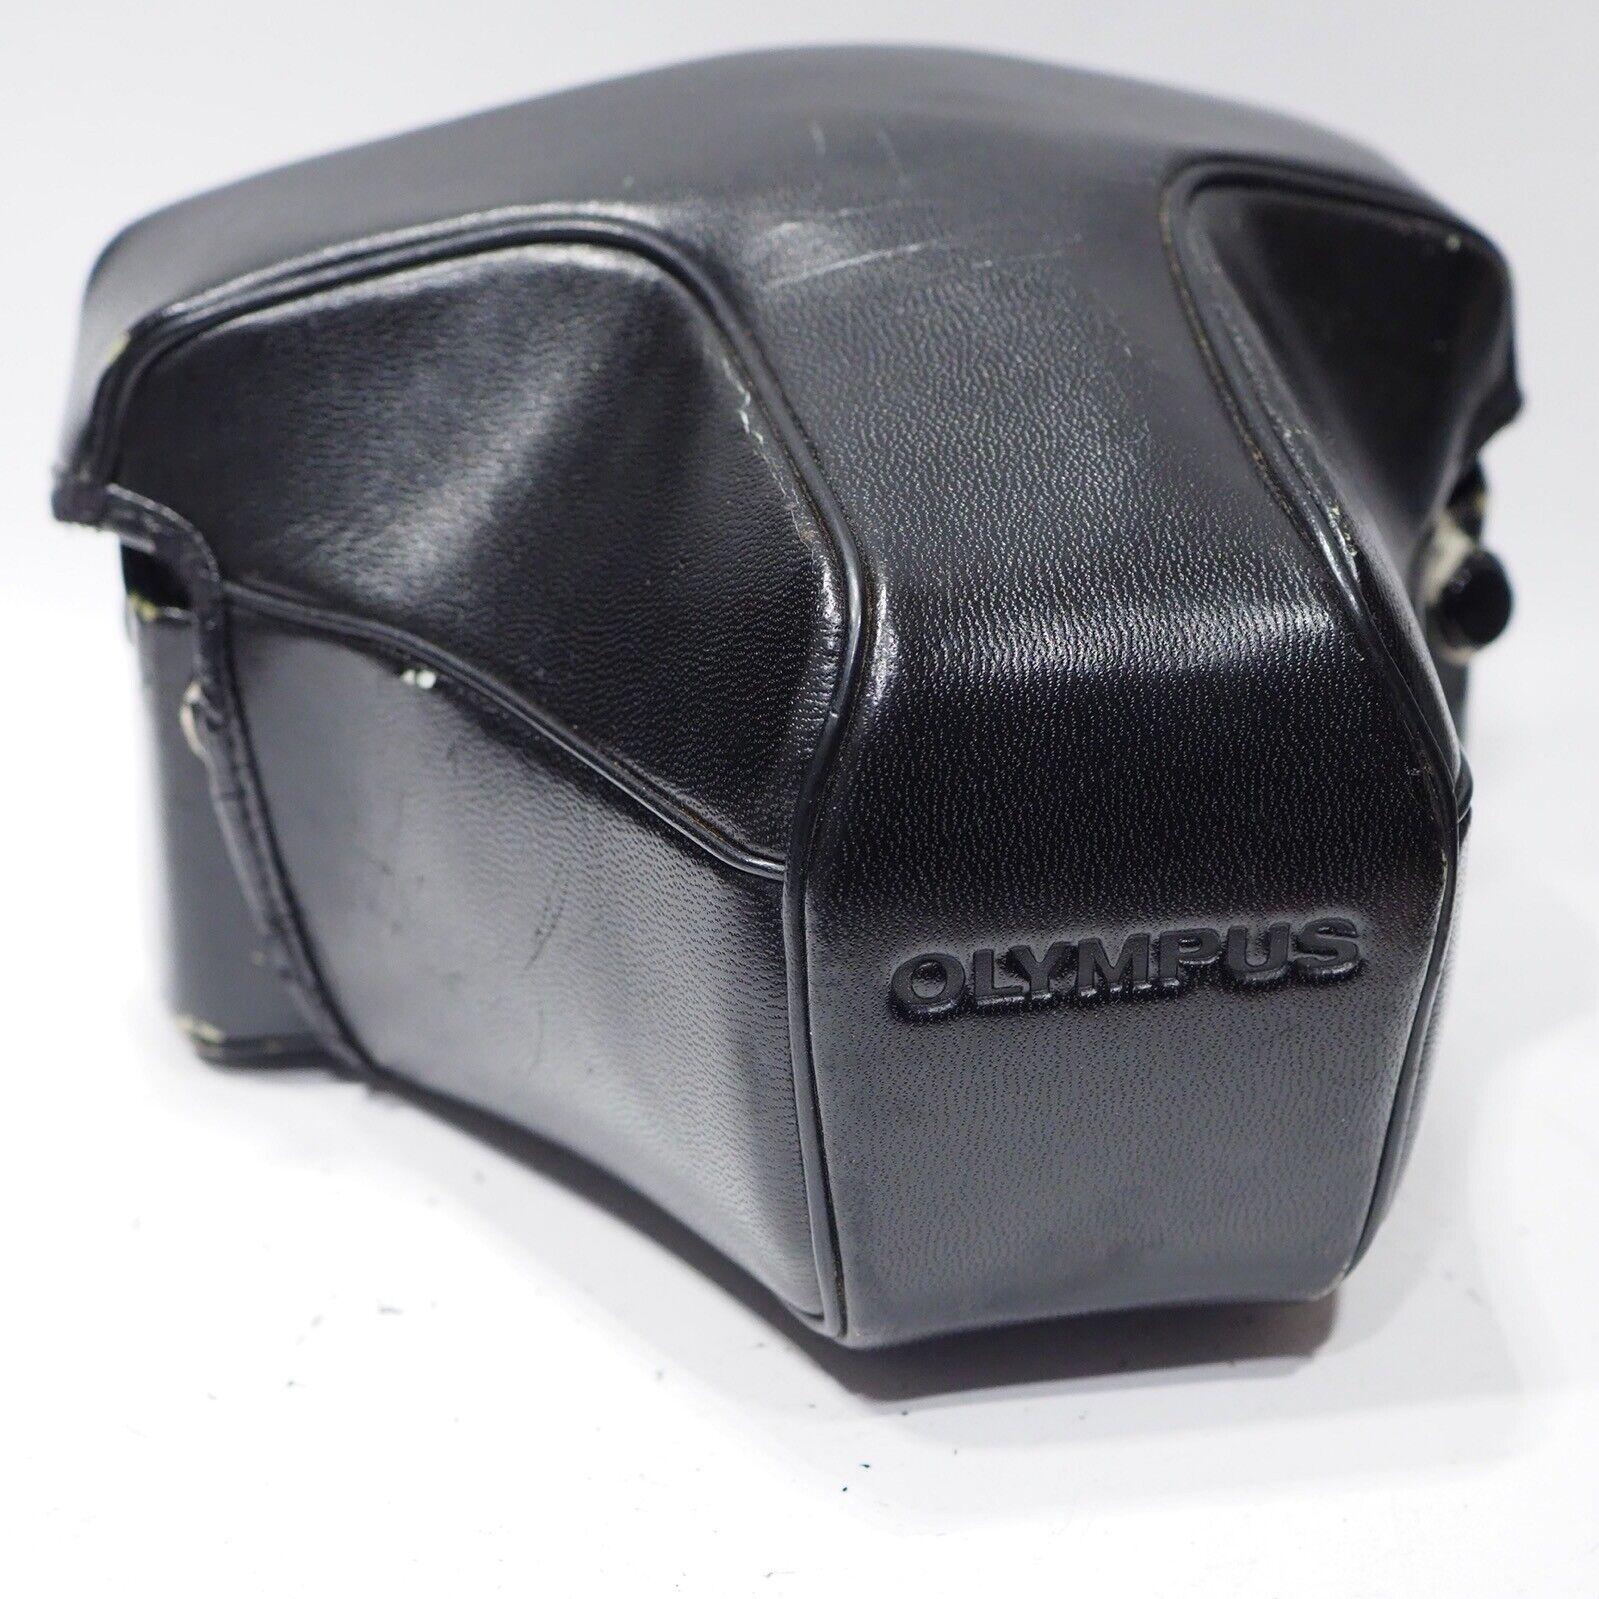 Olympus OM 14N Camera Ever ready case fits OM10 OM 1 3 2 4 M1 & 50mm lens